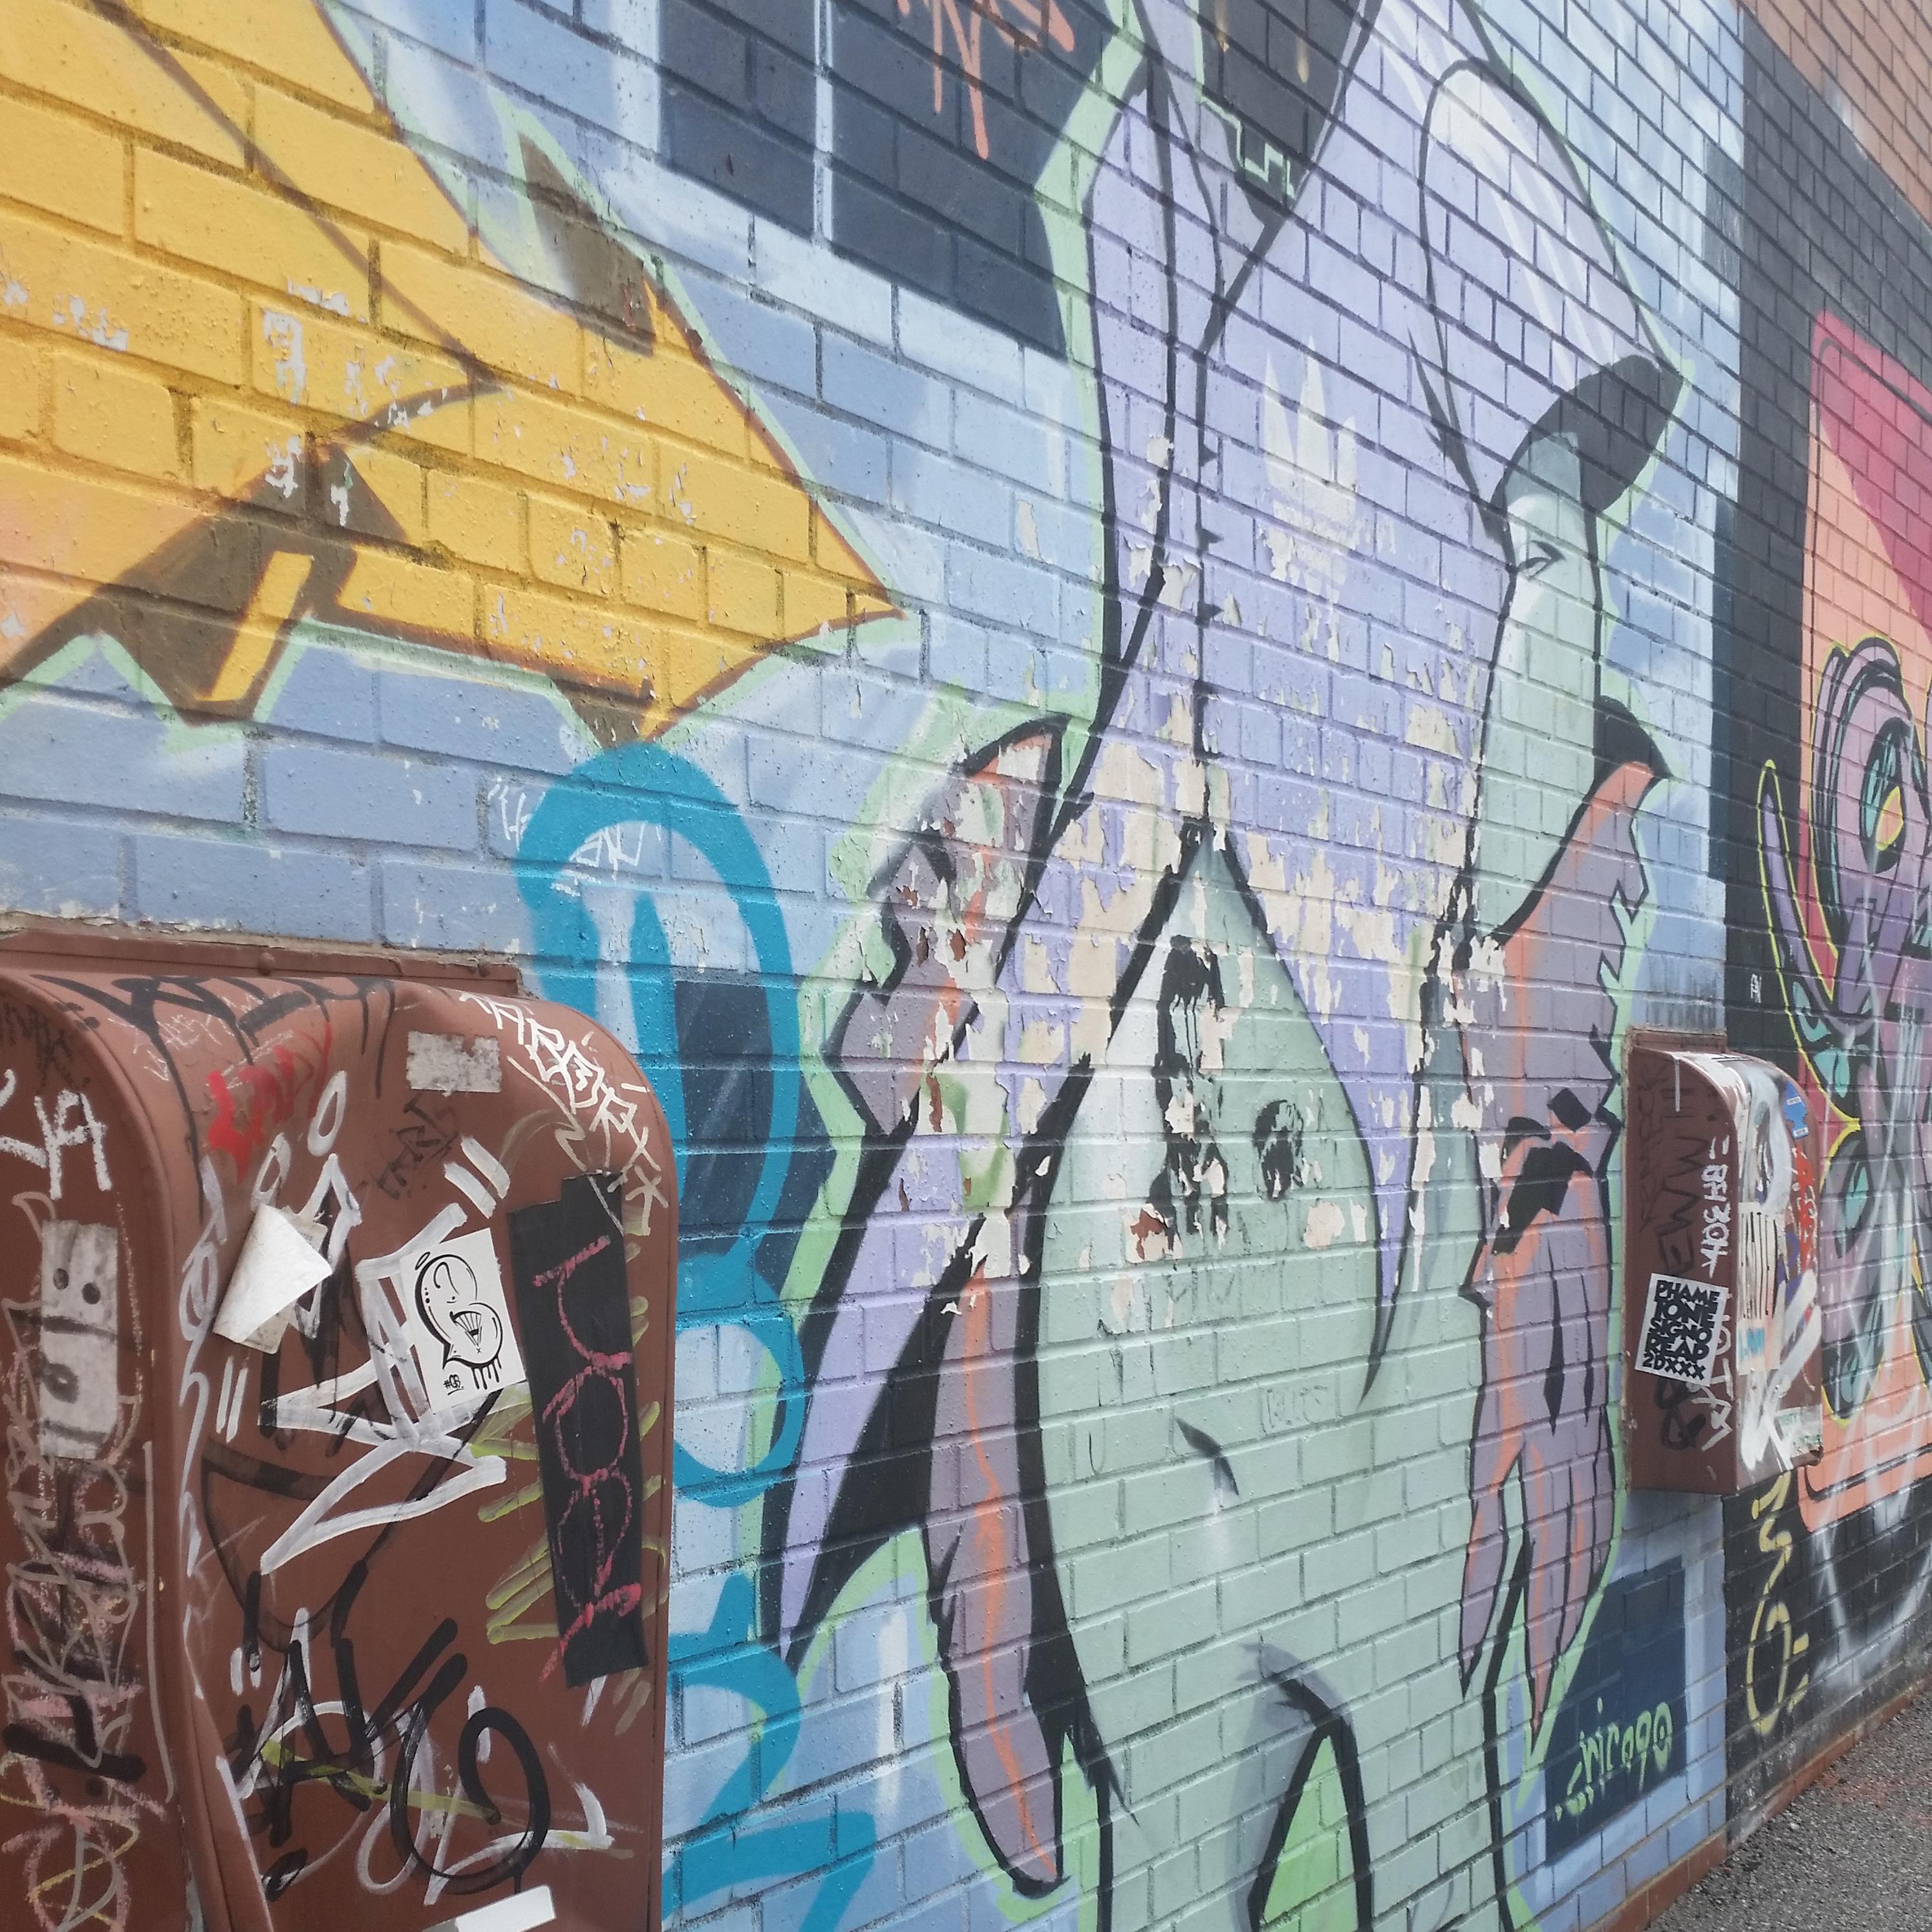 Broad Ripple Street Art